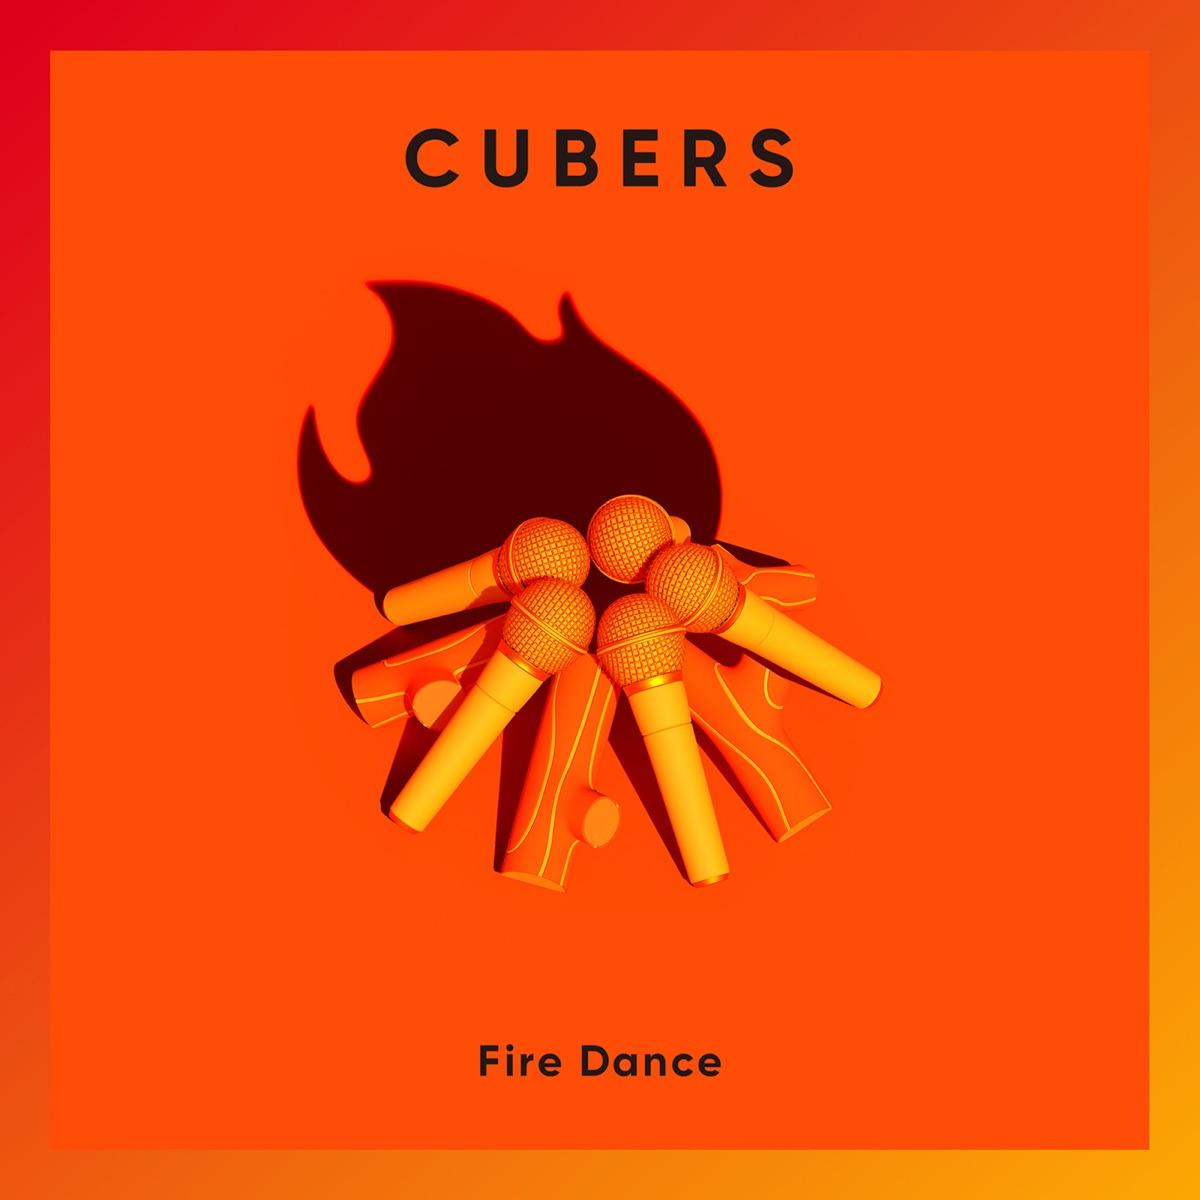 『CUBERS - Fire Dance』収録の『Fire Dance』ジャケット